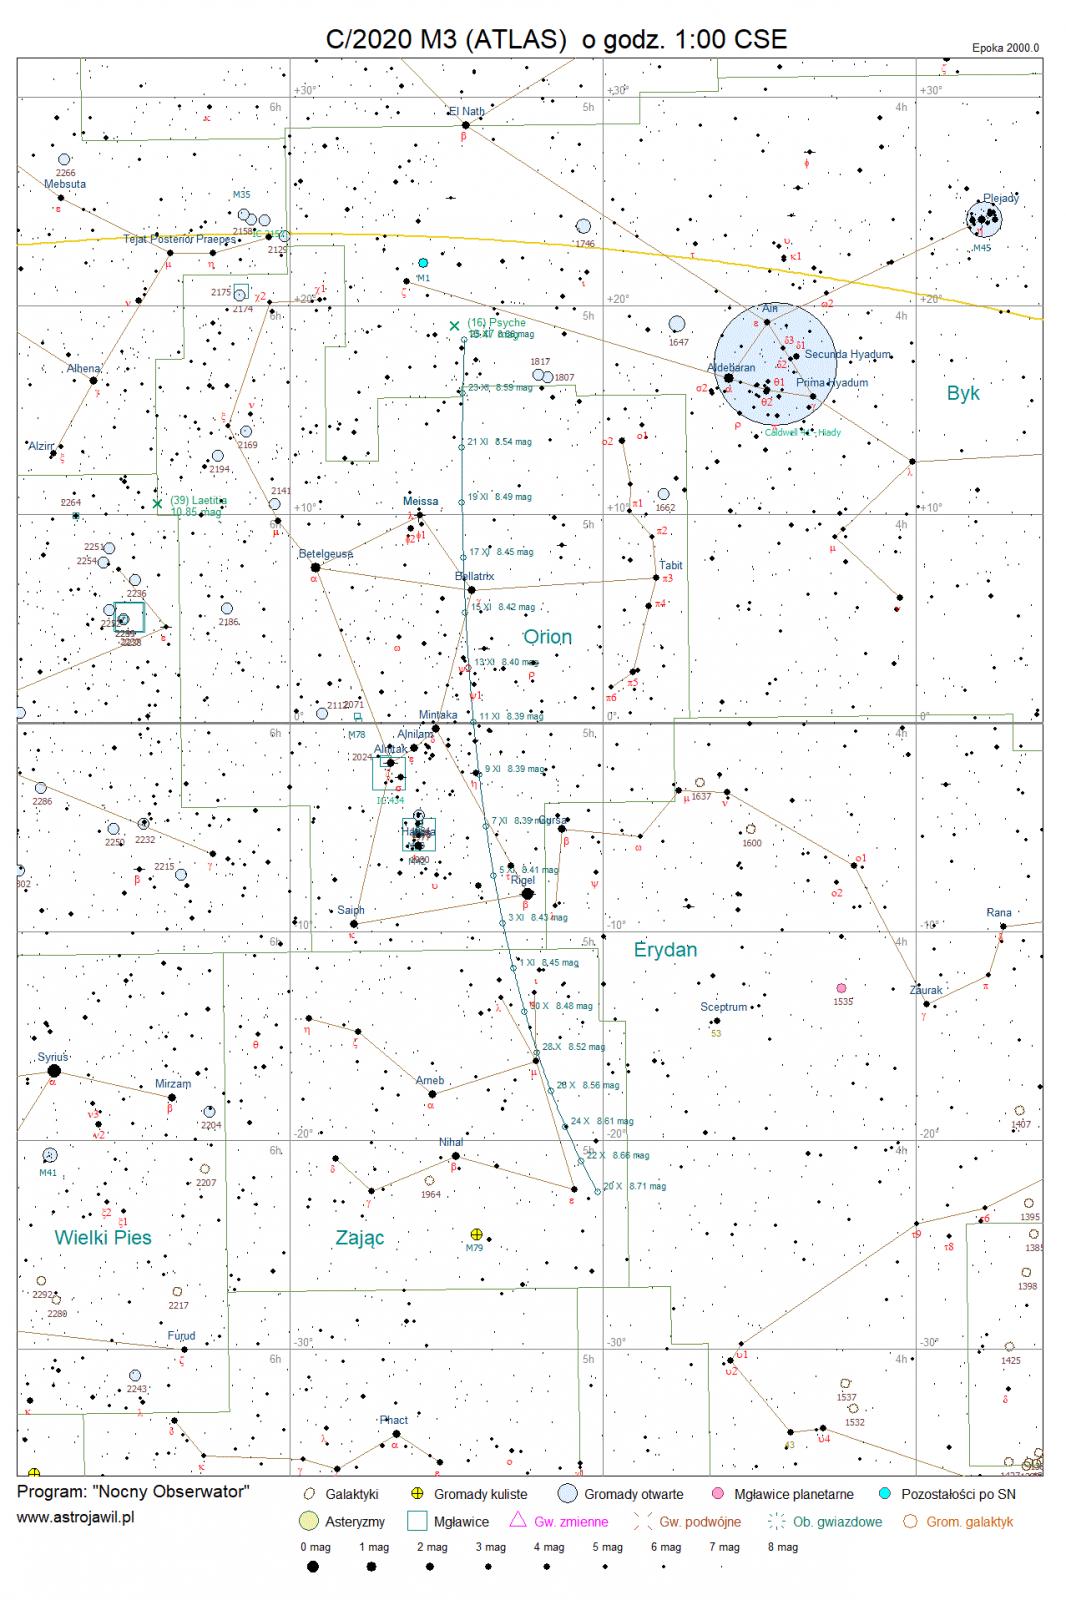 mapa_m3_atlas.png